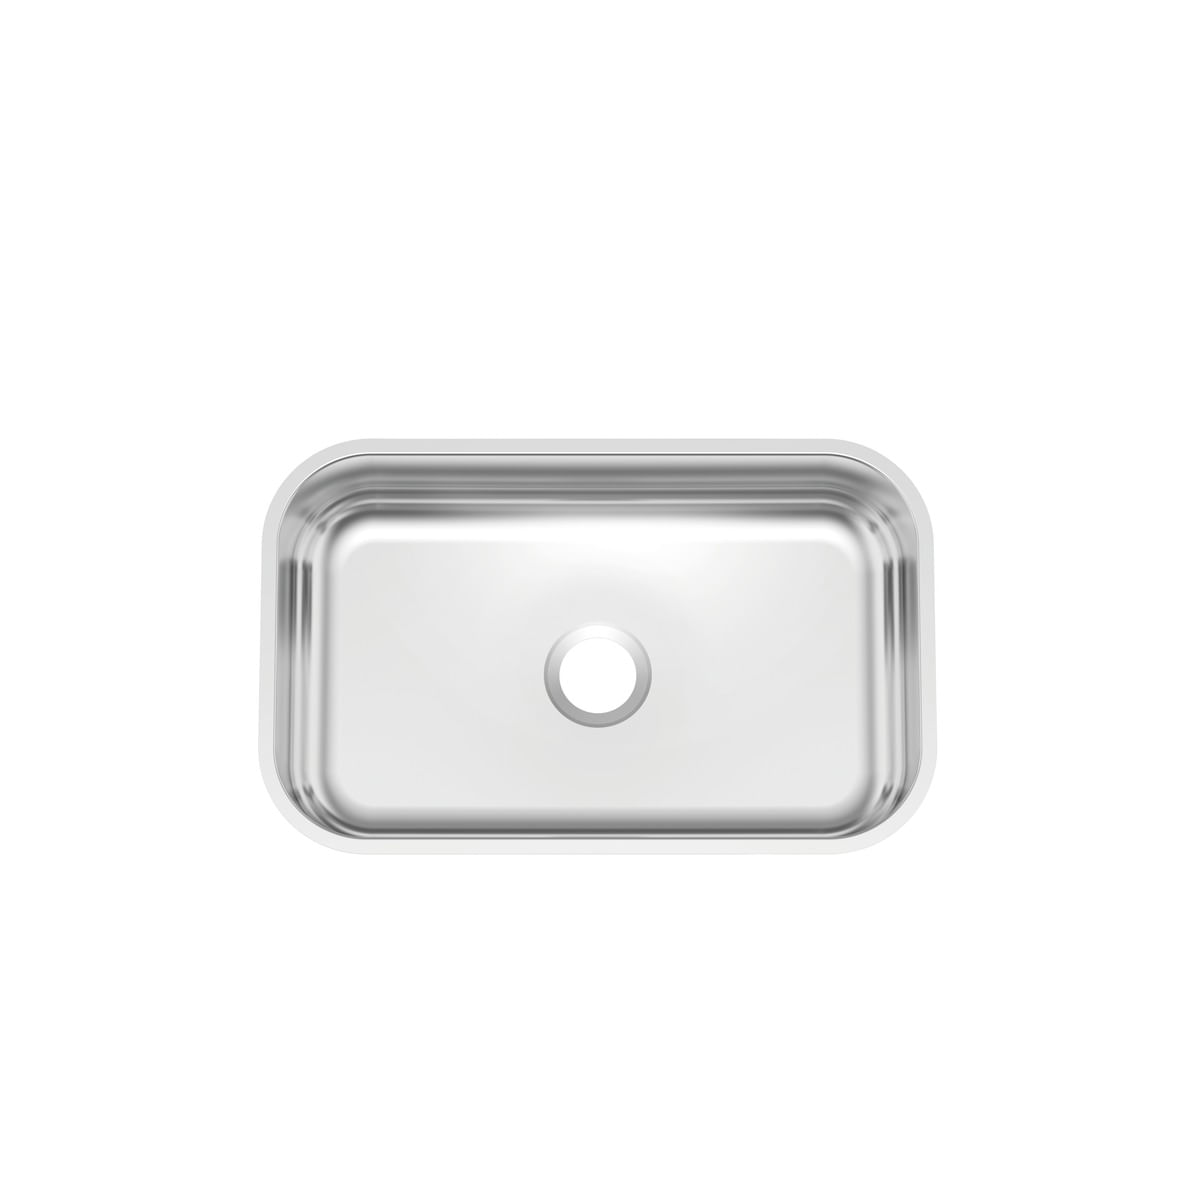 Cuba n.2 Tramontina 56 x 34 x 14 cm Lavínia 56 BL Standard em Aço Inox 430 Polido Sem Válvula